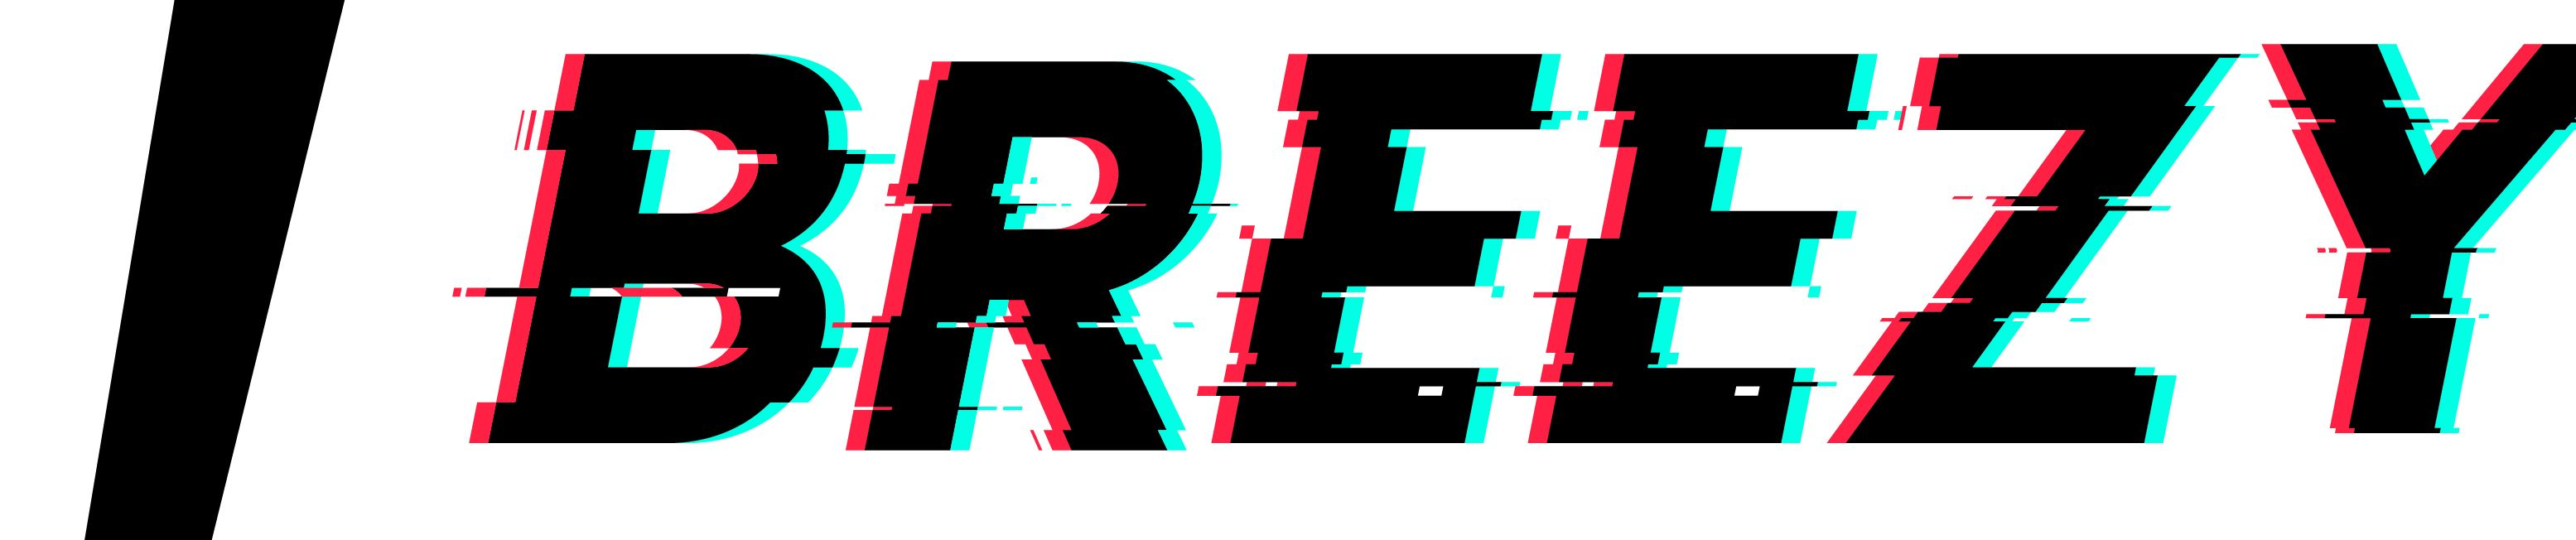 DJ Seth Breezy   Free Listening on SoundCloud